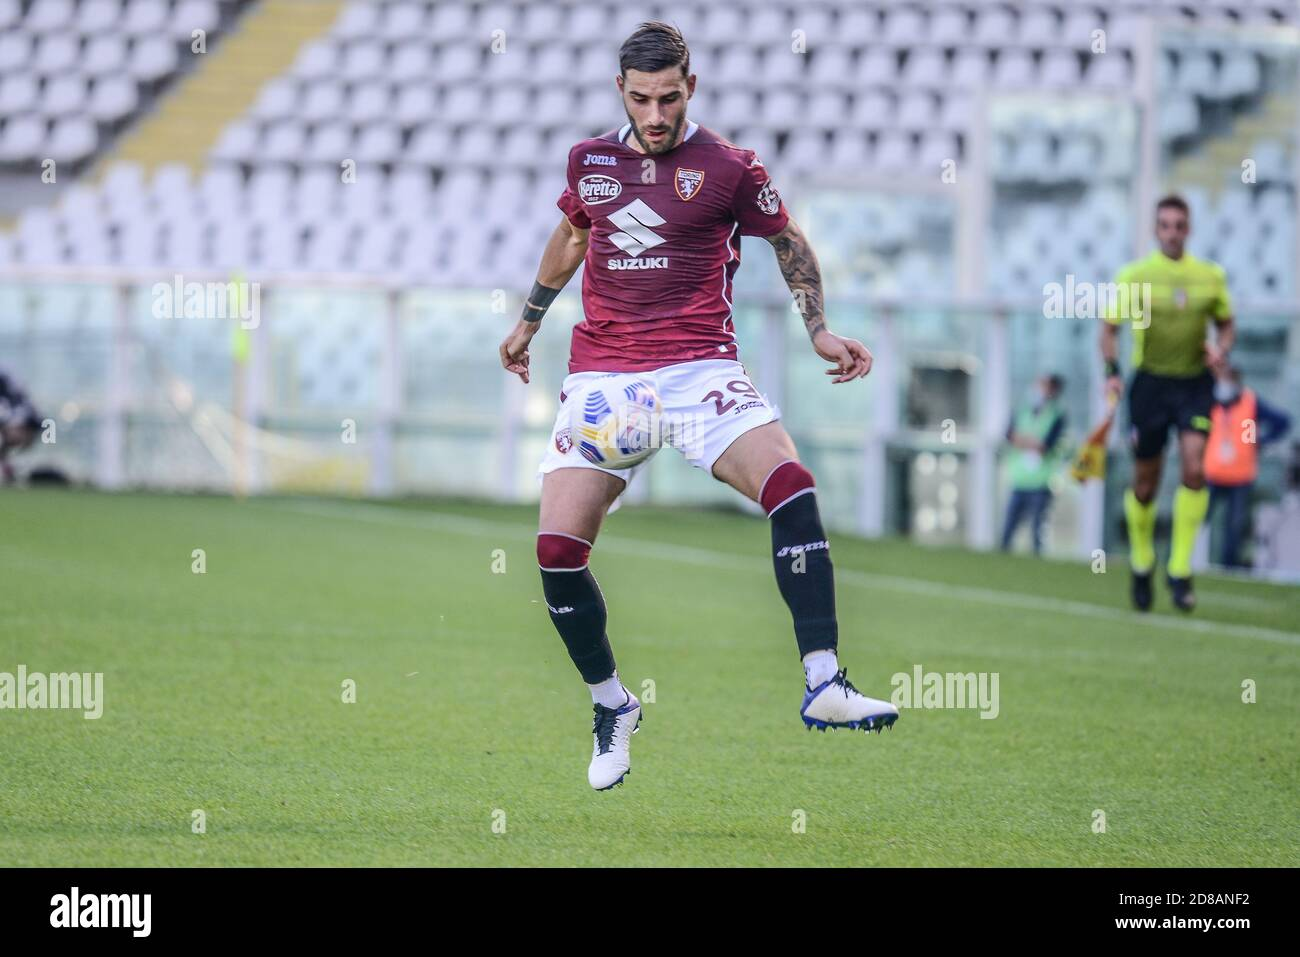 Nicola Murru of Torino FC during the Coppa Italia football match between Torino FC and US Lecce at Olympic Grande Torino Stadium on October 18, 2020 i Stock Photo